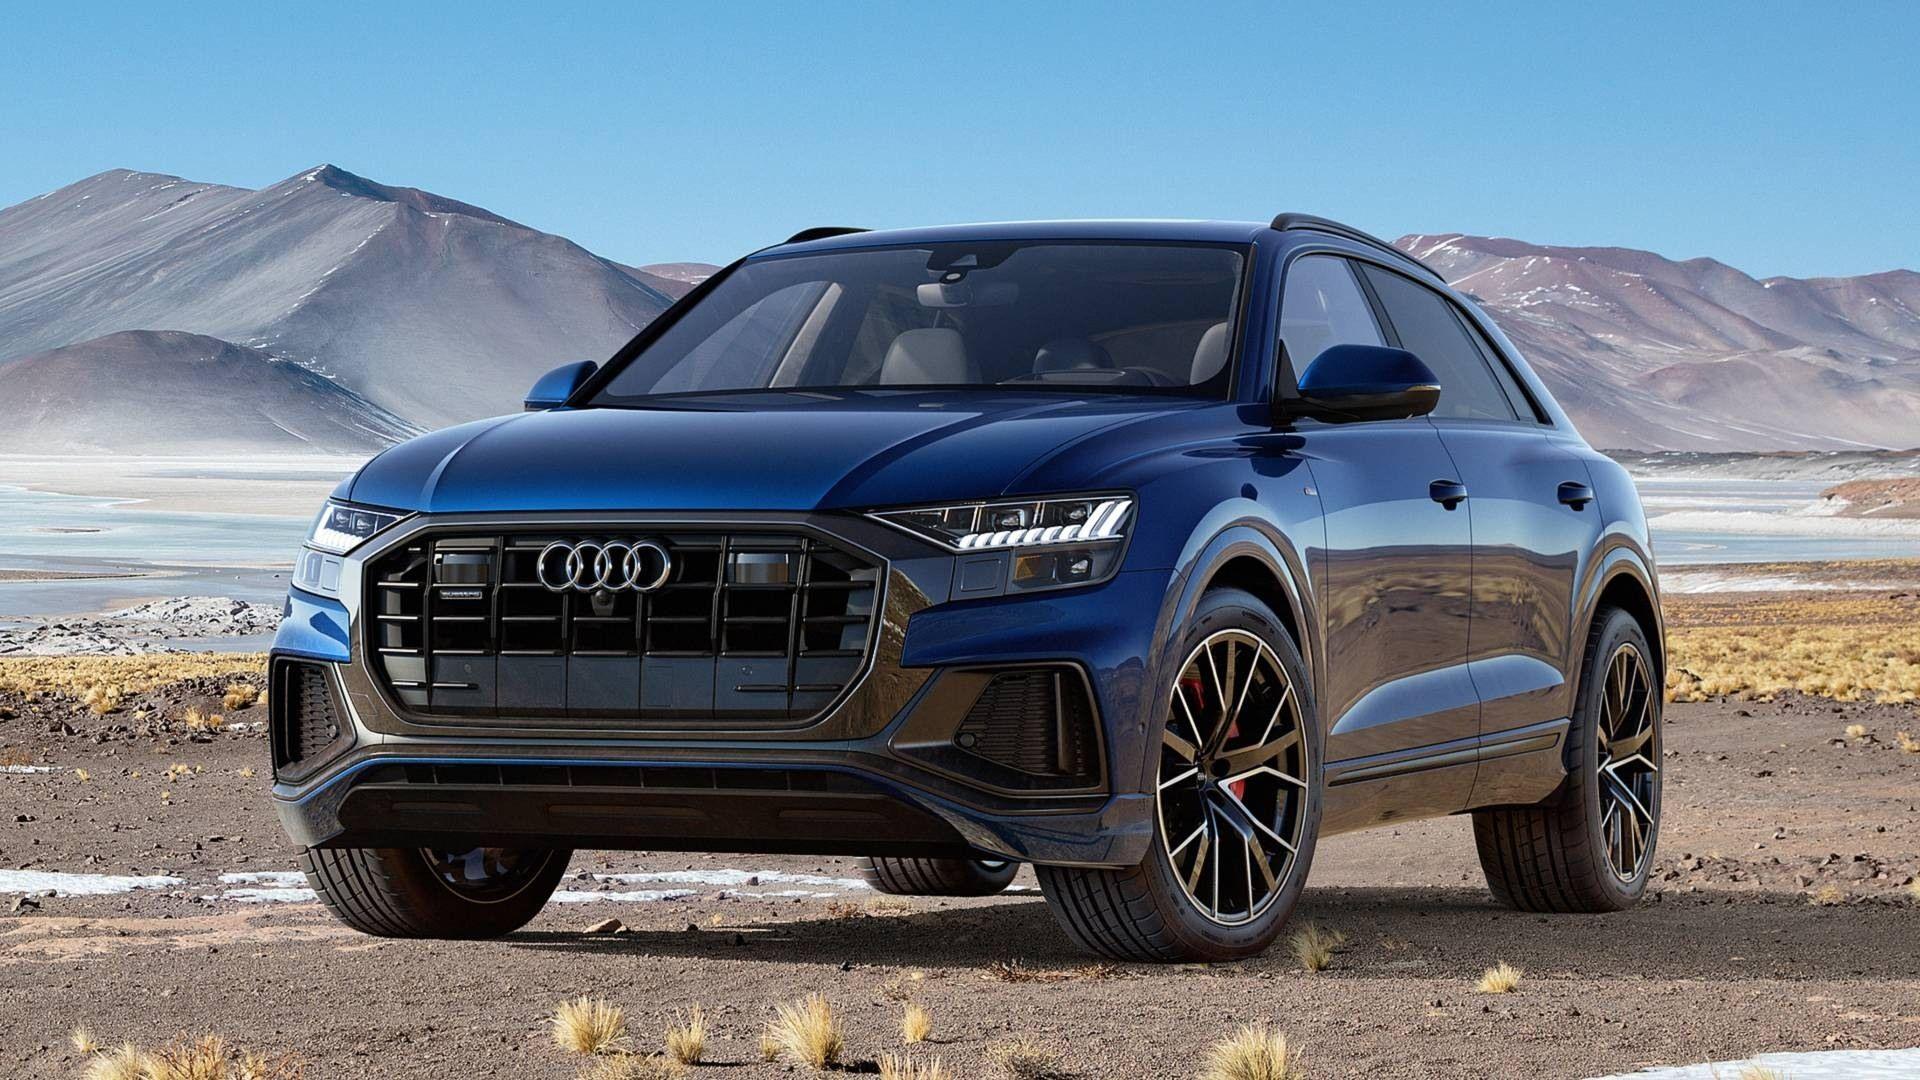 Audi Q8 2019 Release Date Price And Review Audi Q8 Audi Q8 2019 Audi Q8 2020